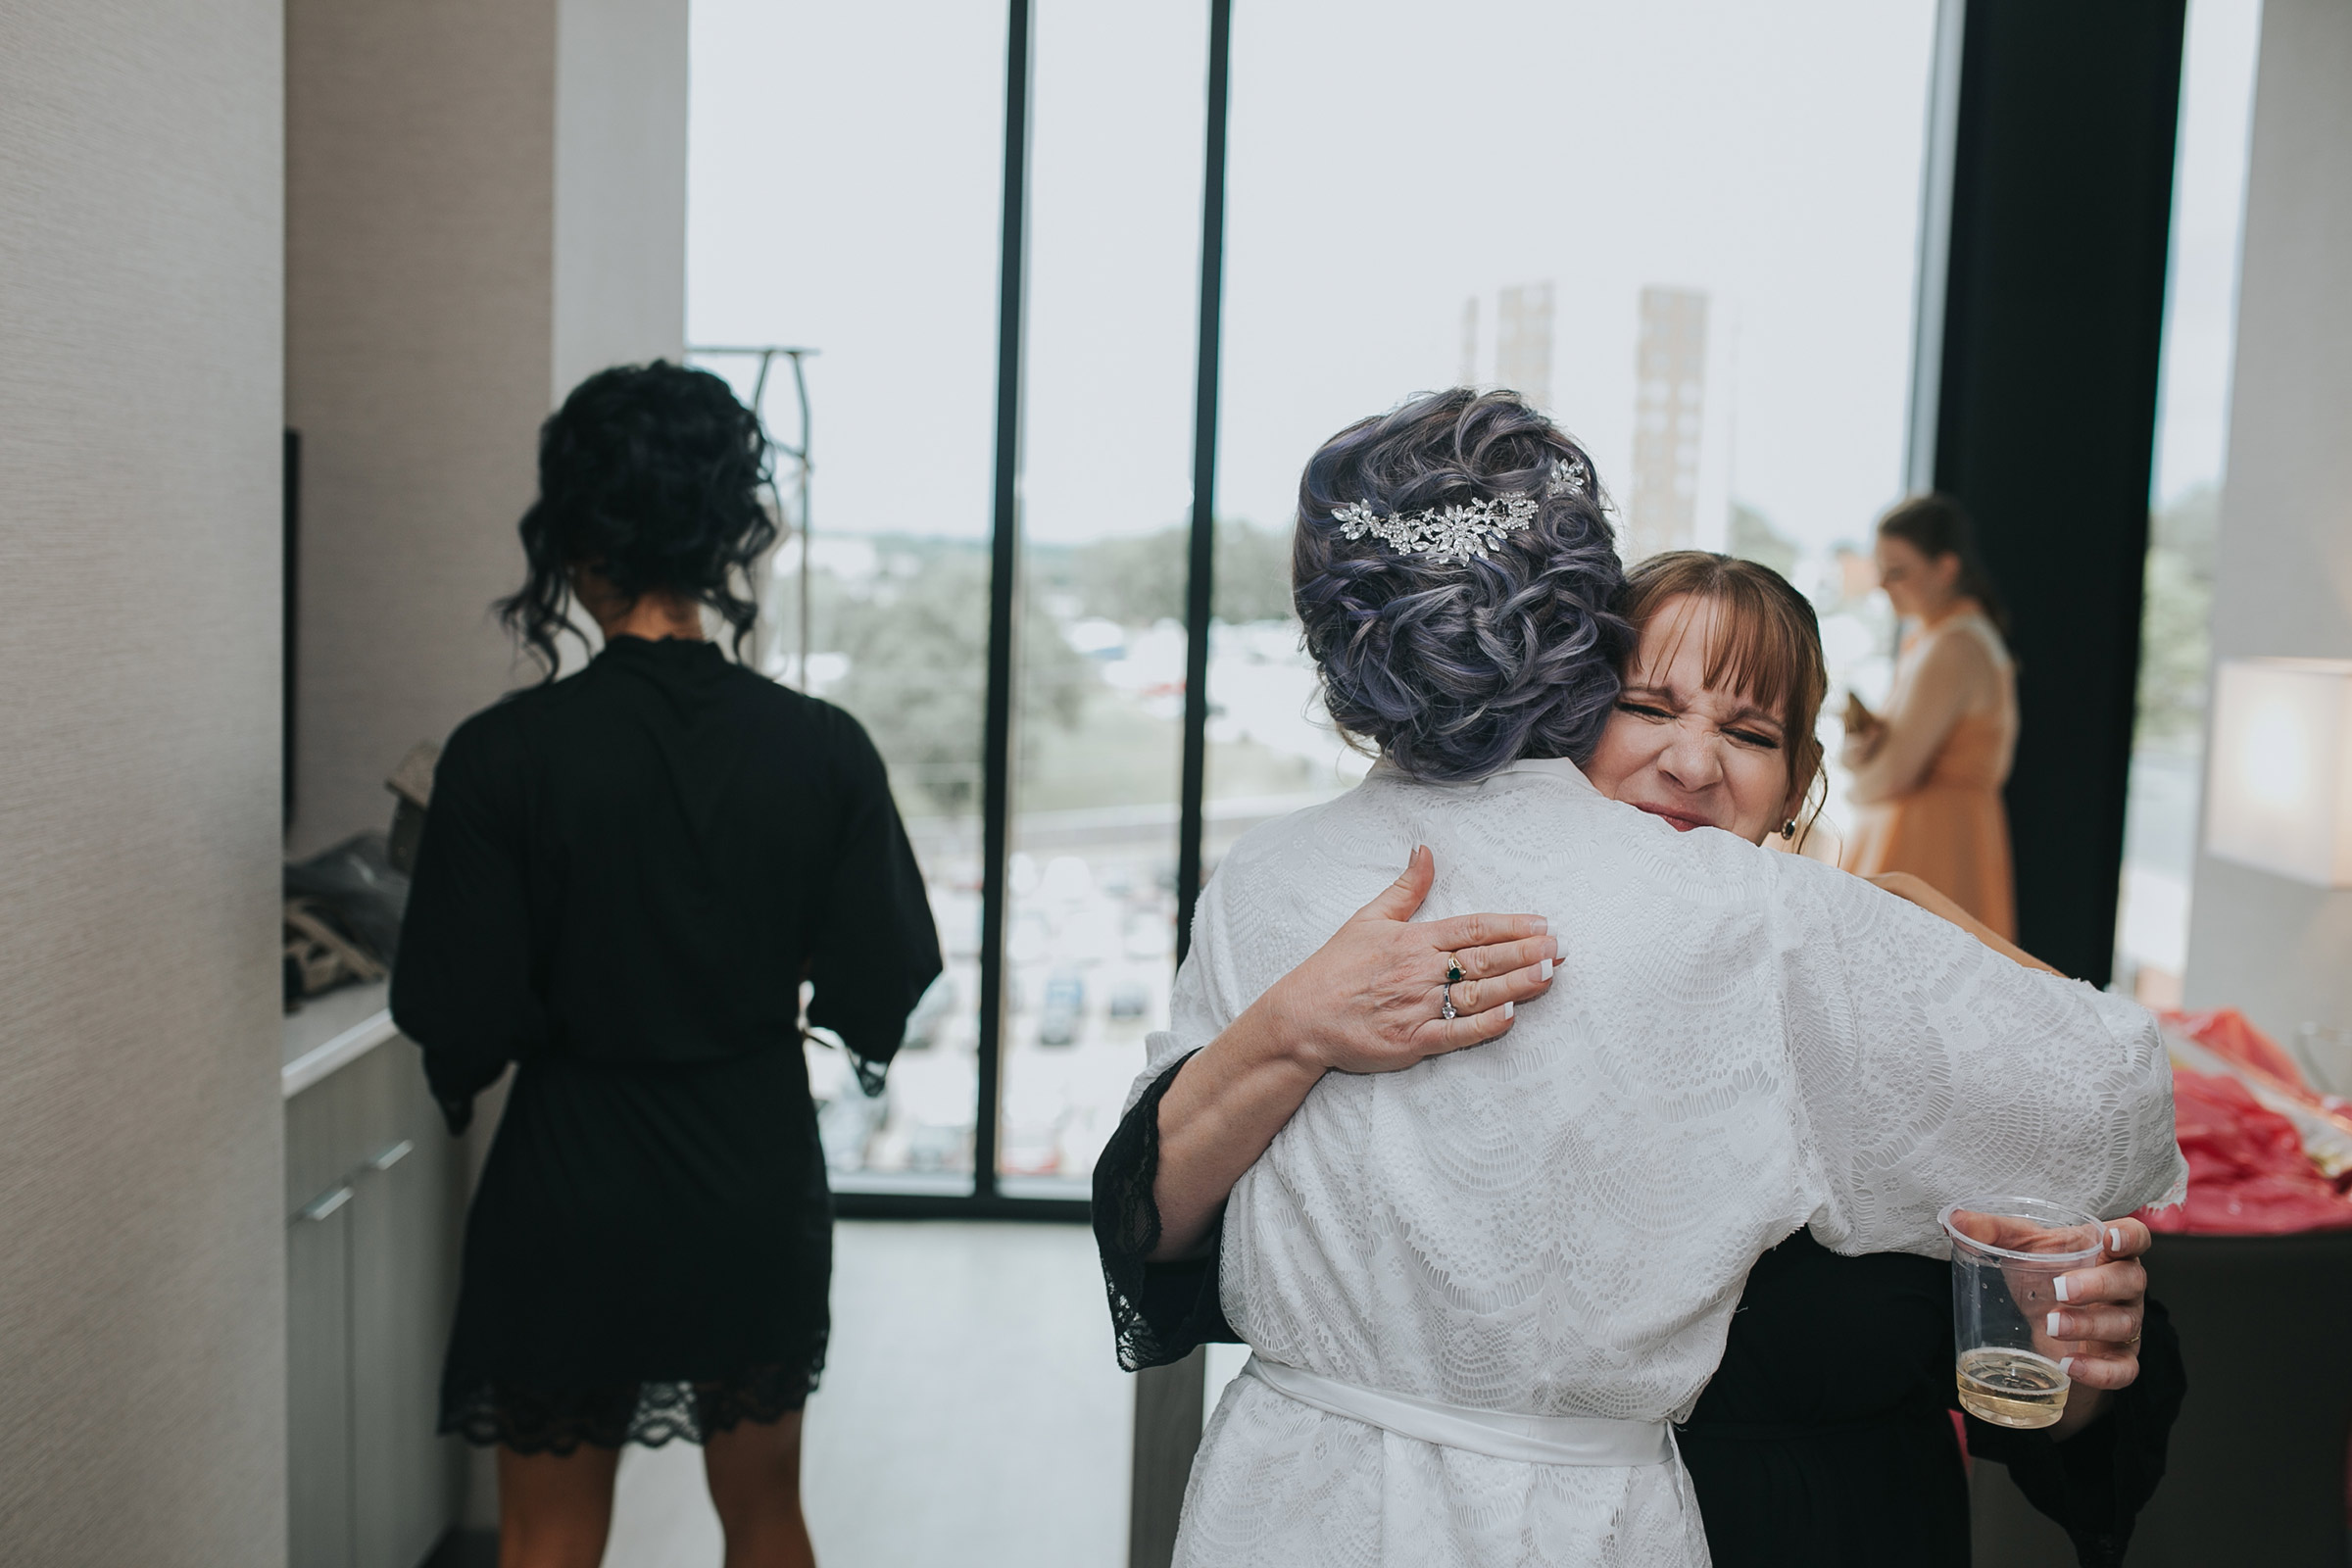 mother-of-bride-hugging-bride-desmoines-iowa-ac-hotel-raelyn-ramey-photography.jpg